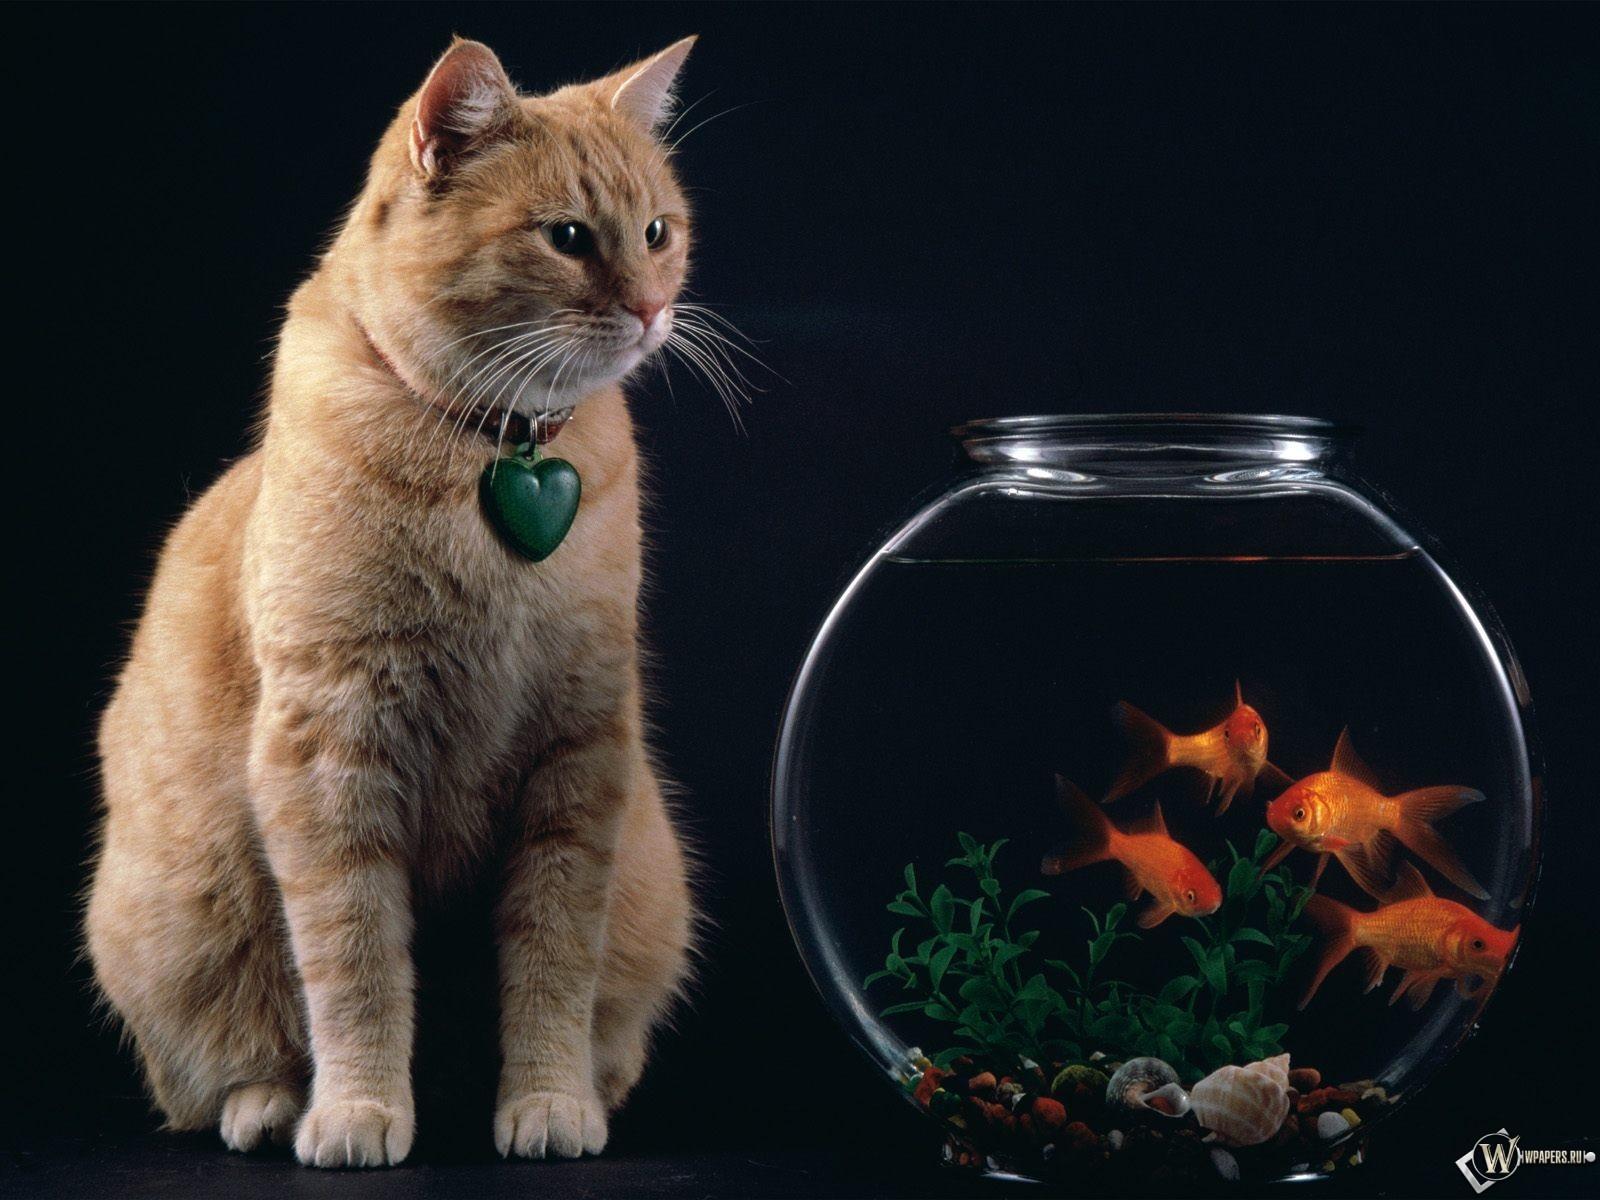 Кот с аквариумом рыбок 1600x1200